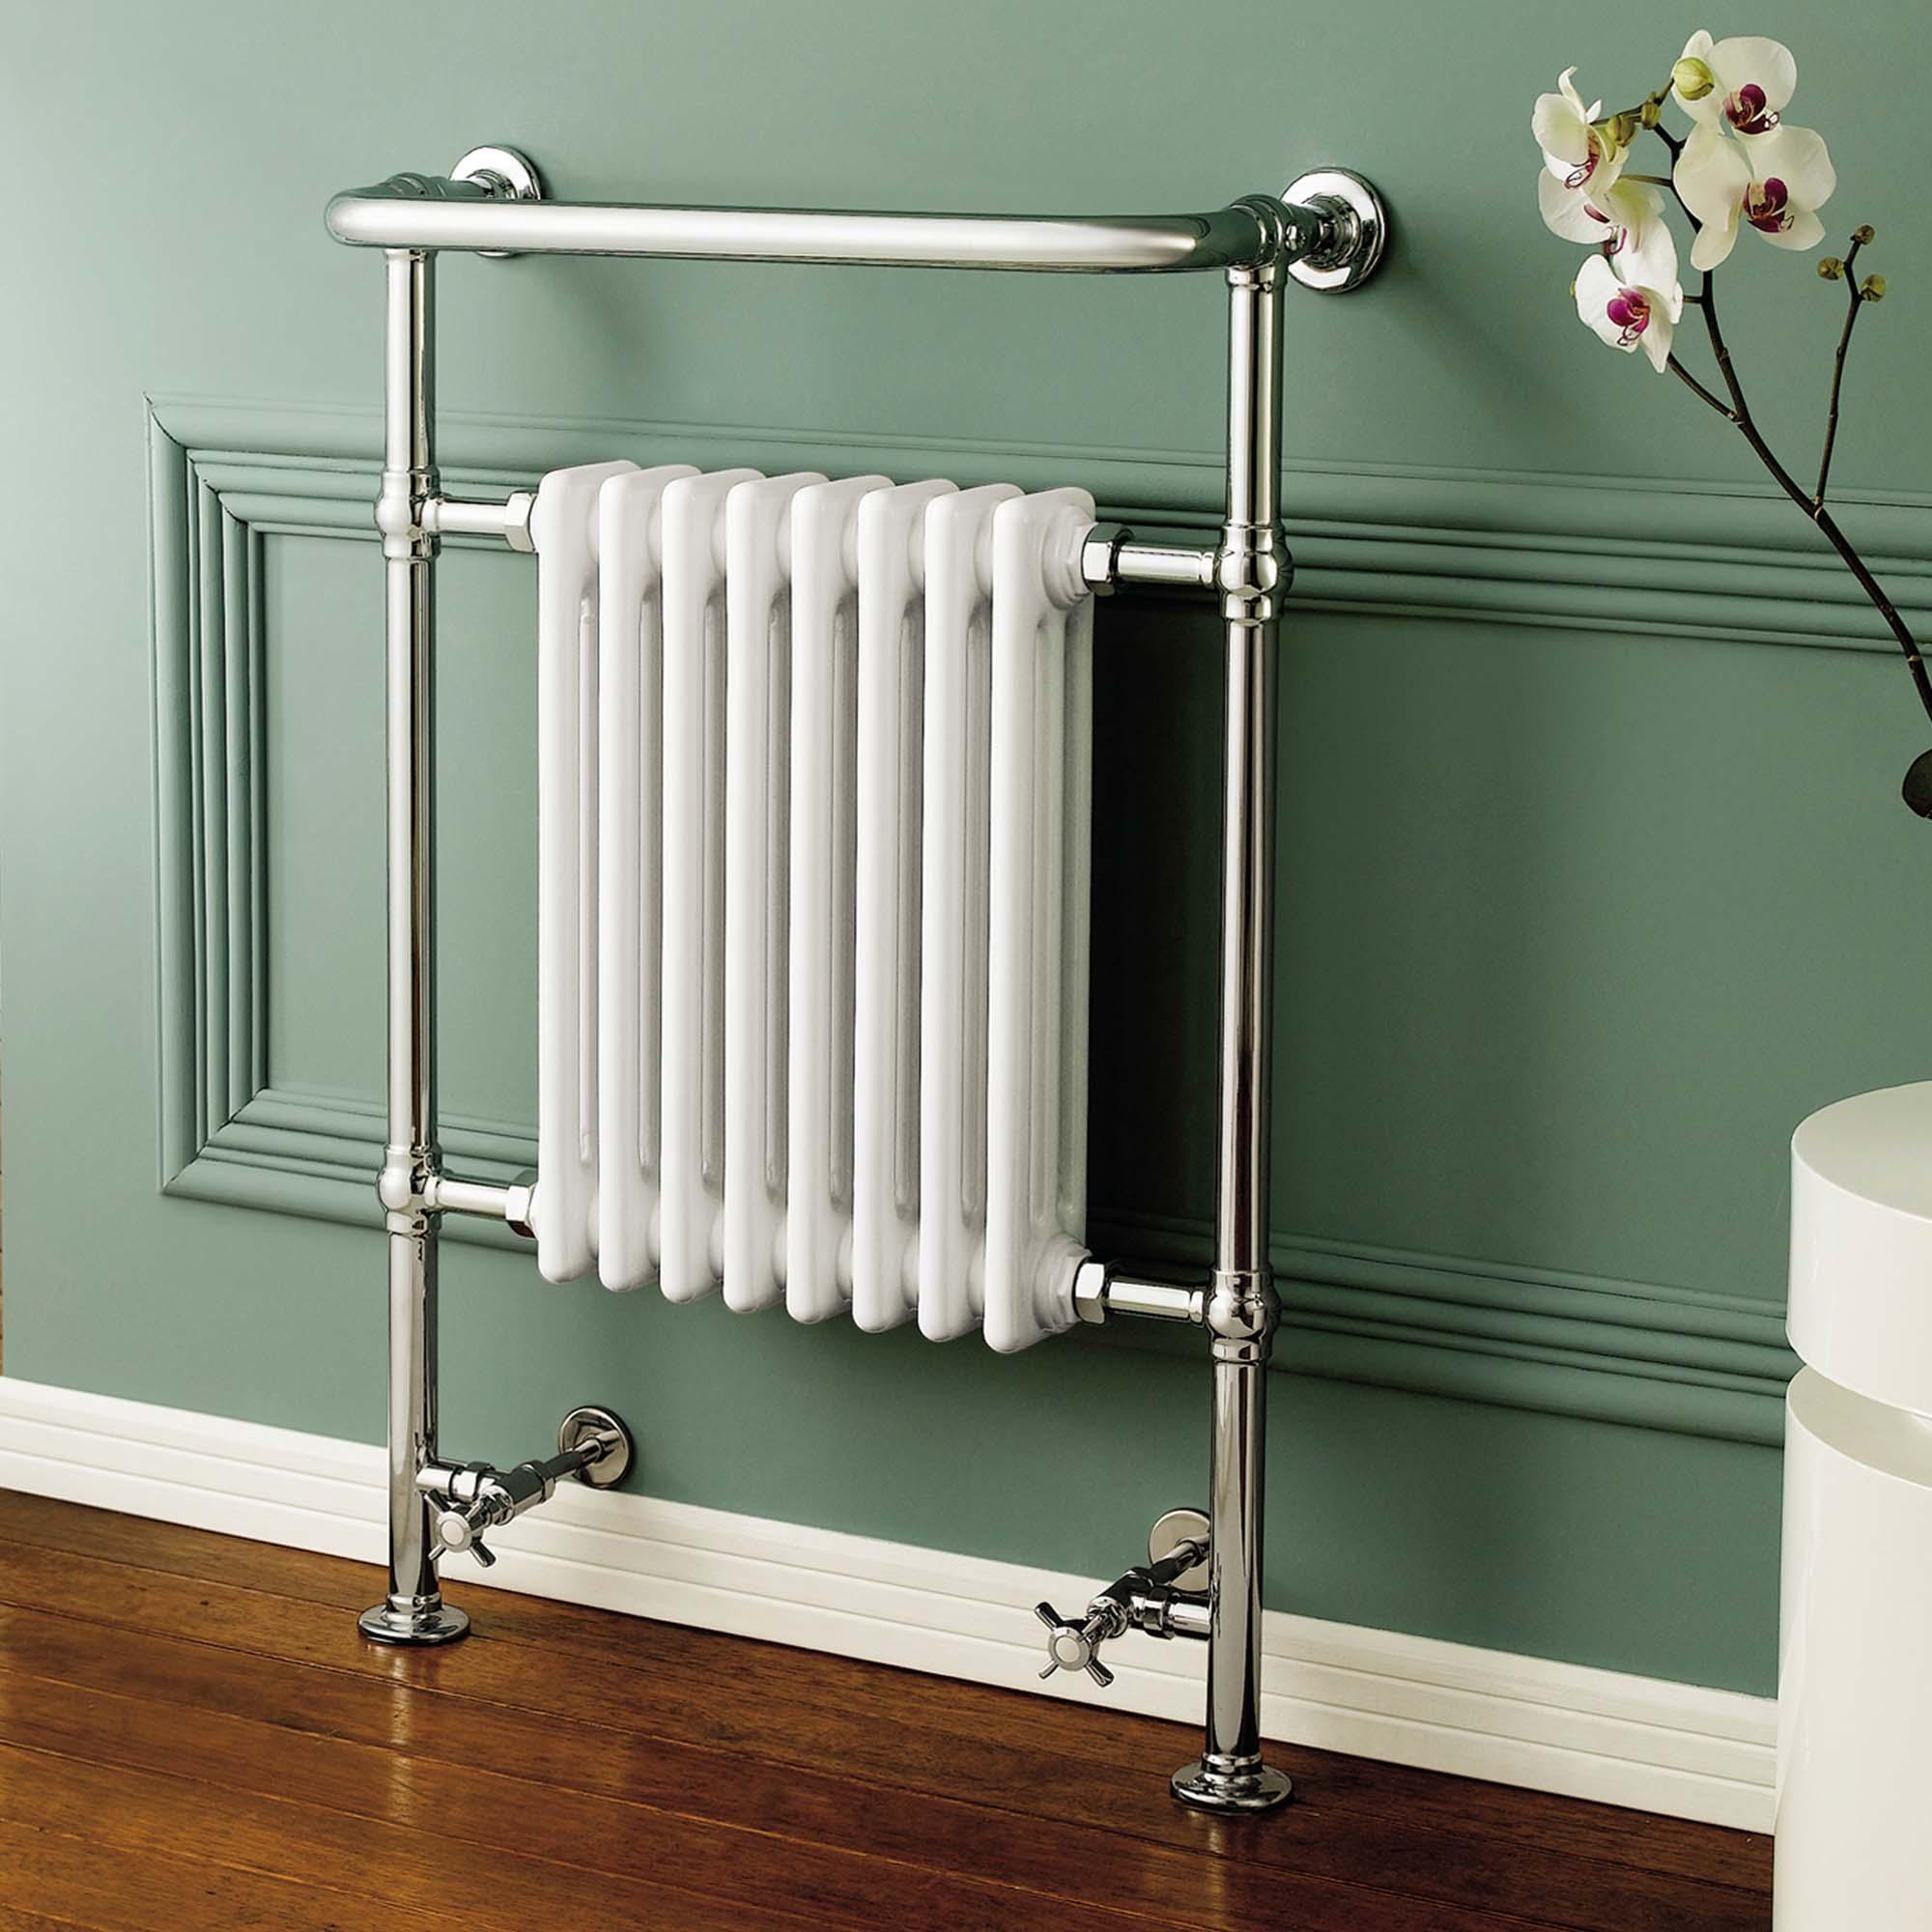 traditional bathroom heated towel rail column victorian. Black Bedroom Furniture Sets. Home Design Ideas